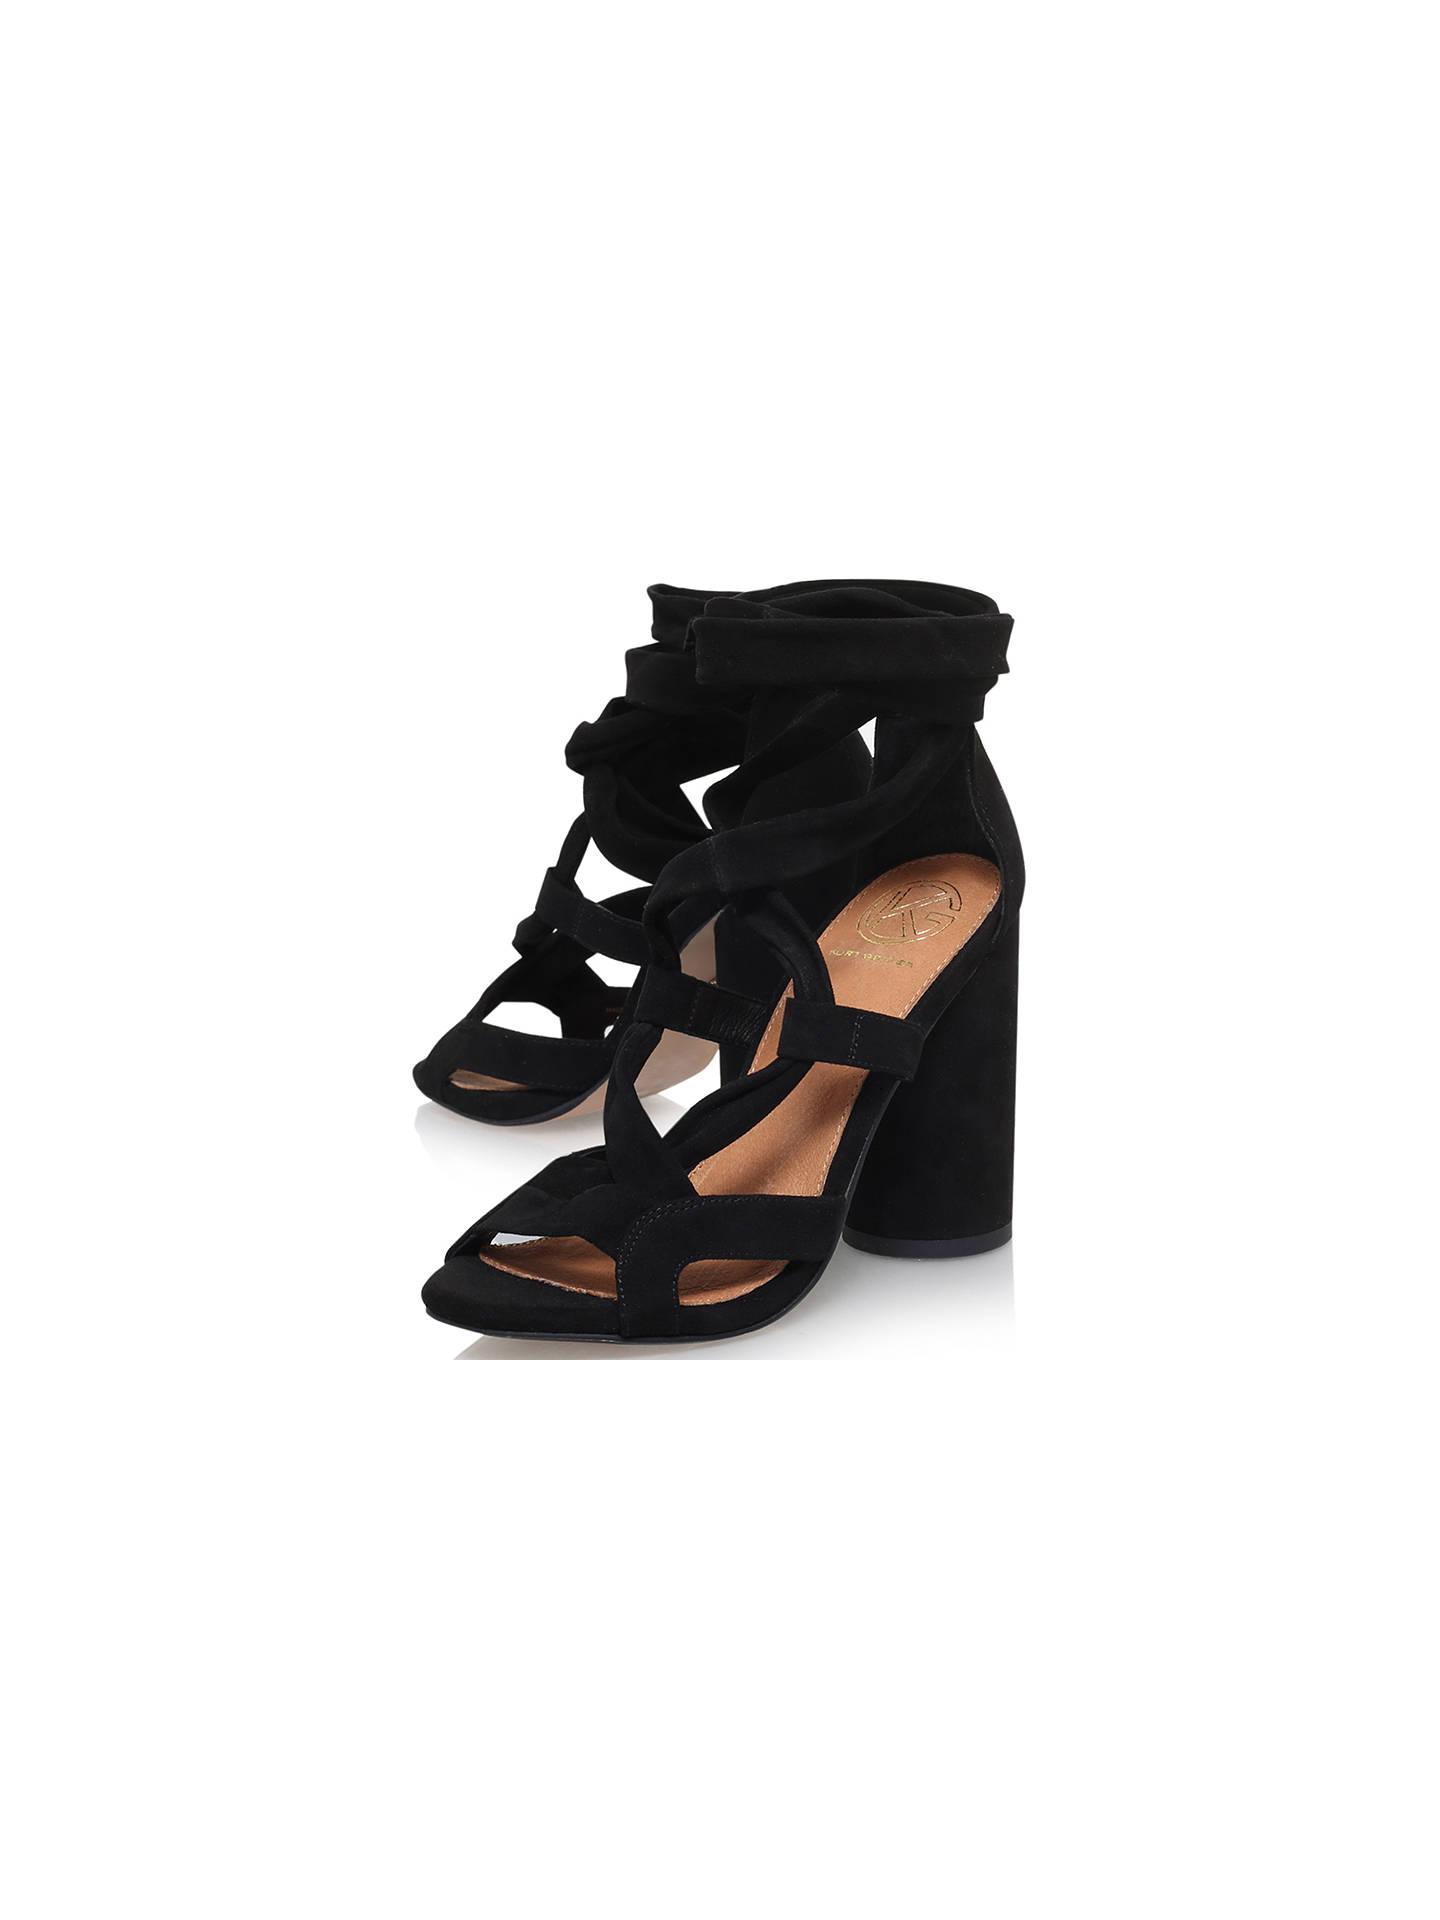 3dd00405e7c5 ... Buy KG by Kurt Geiger Mia Multi Strap Tie Sandals